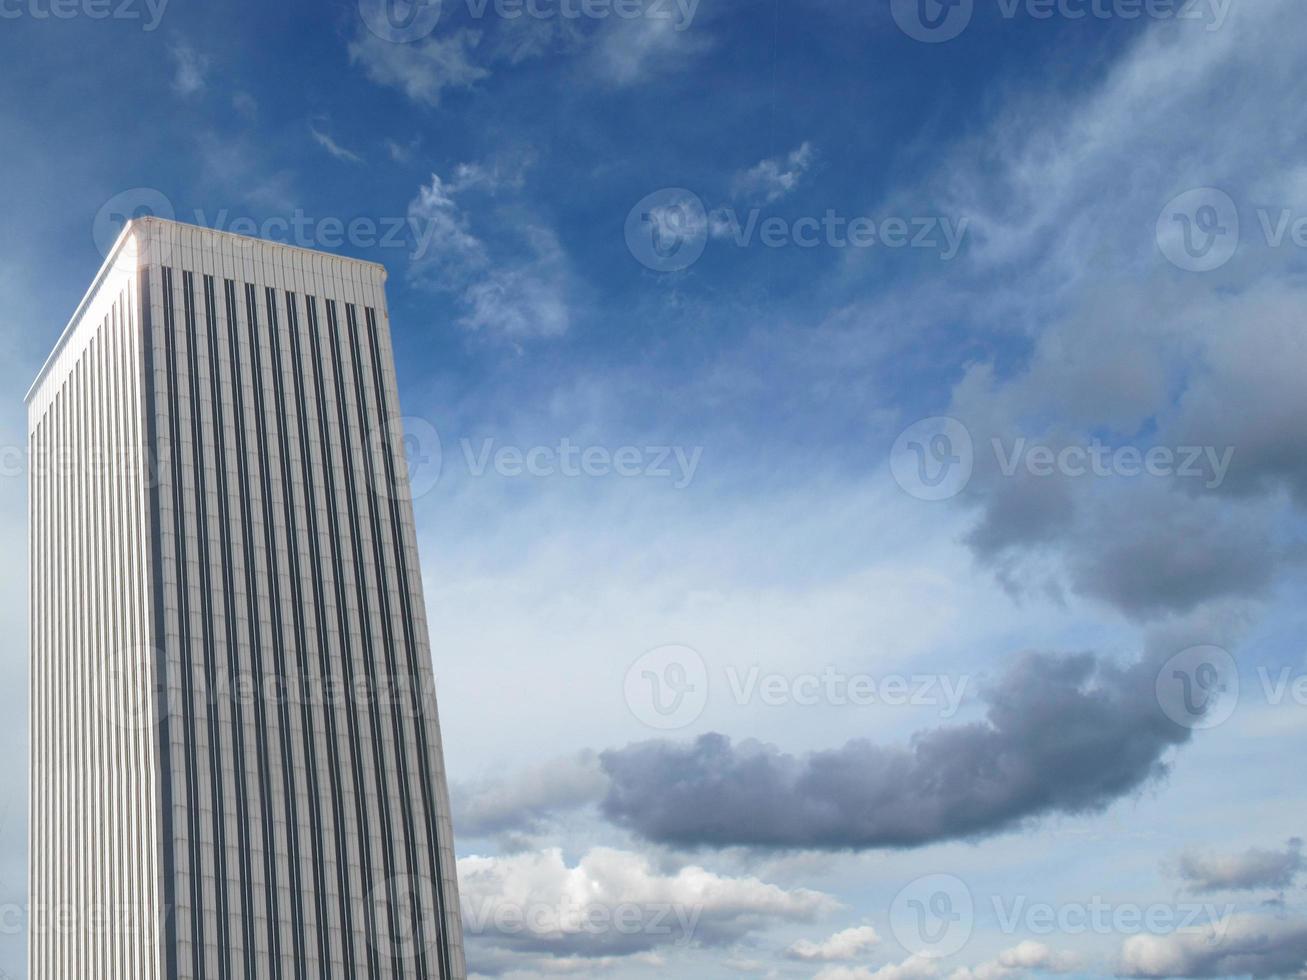 Solitaire skyscrapers photo